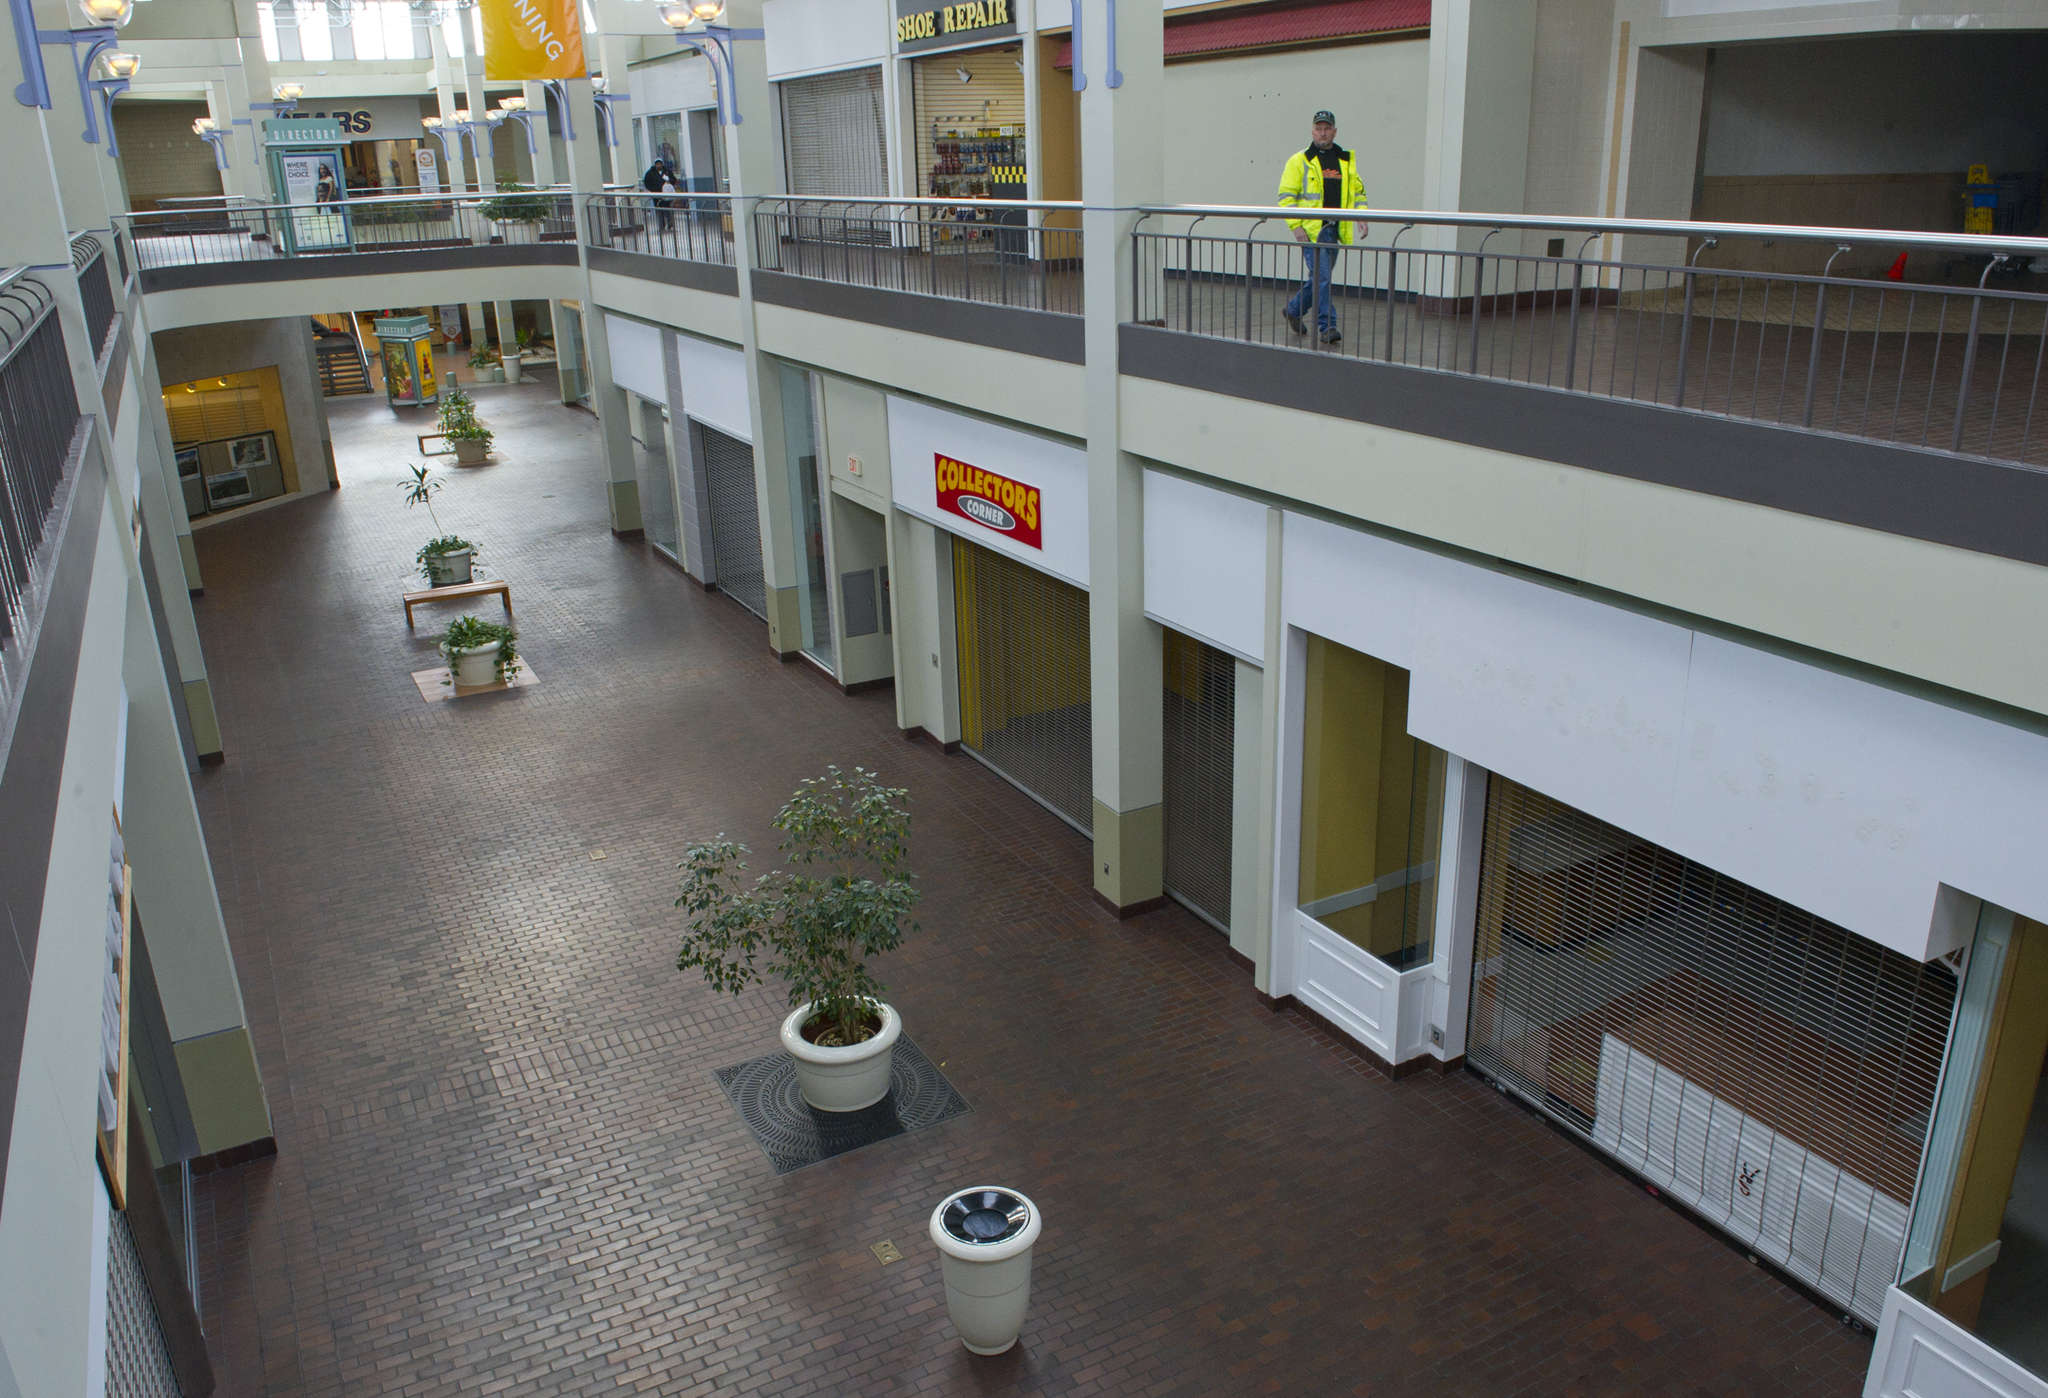 The old Burlington Center in Burlington Township, now called the Marketplace at Burlington, has lost tenants.